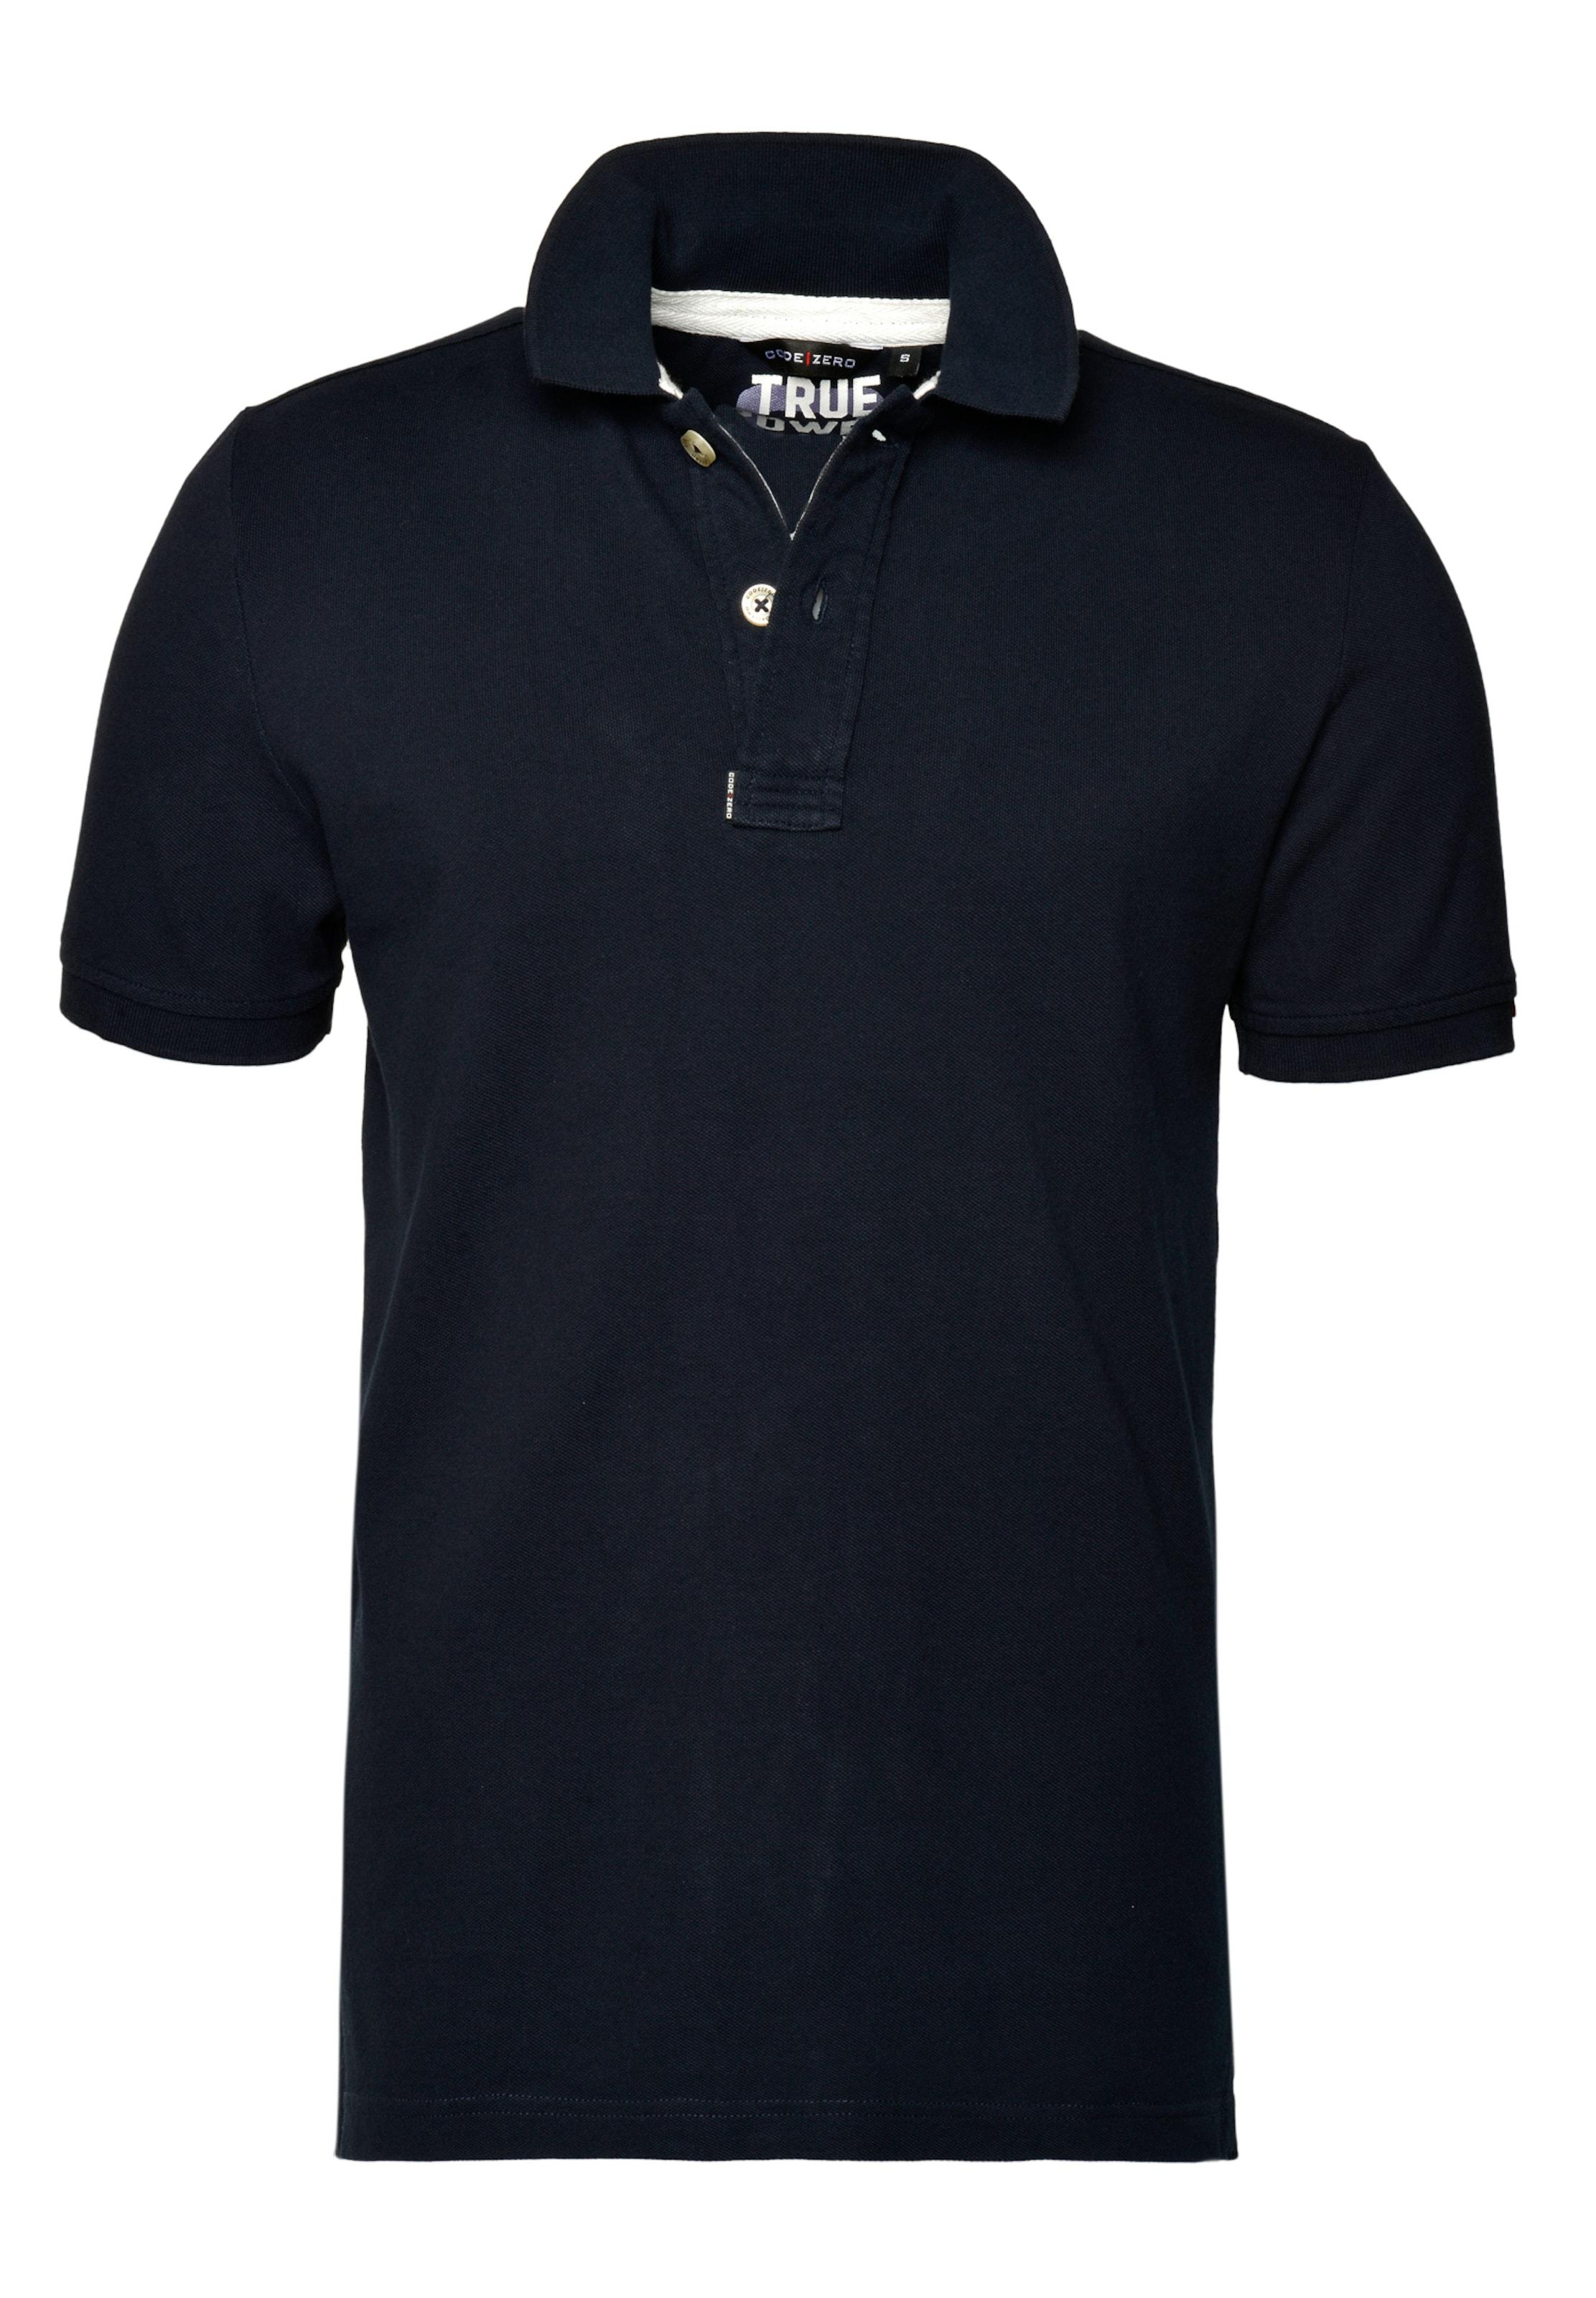 In Code zero 'shore Kobaltblau Poloshirt Polo' bgY6f7y